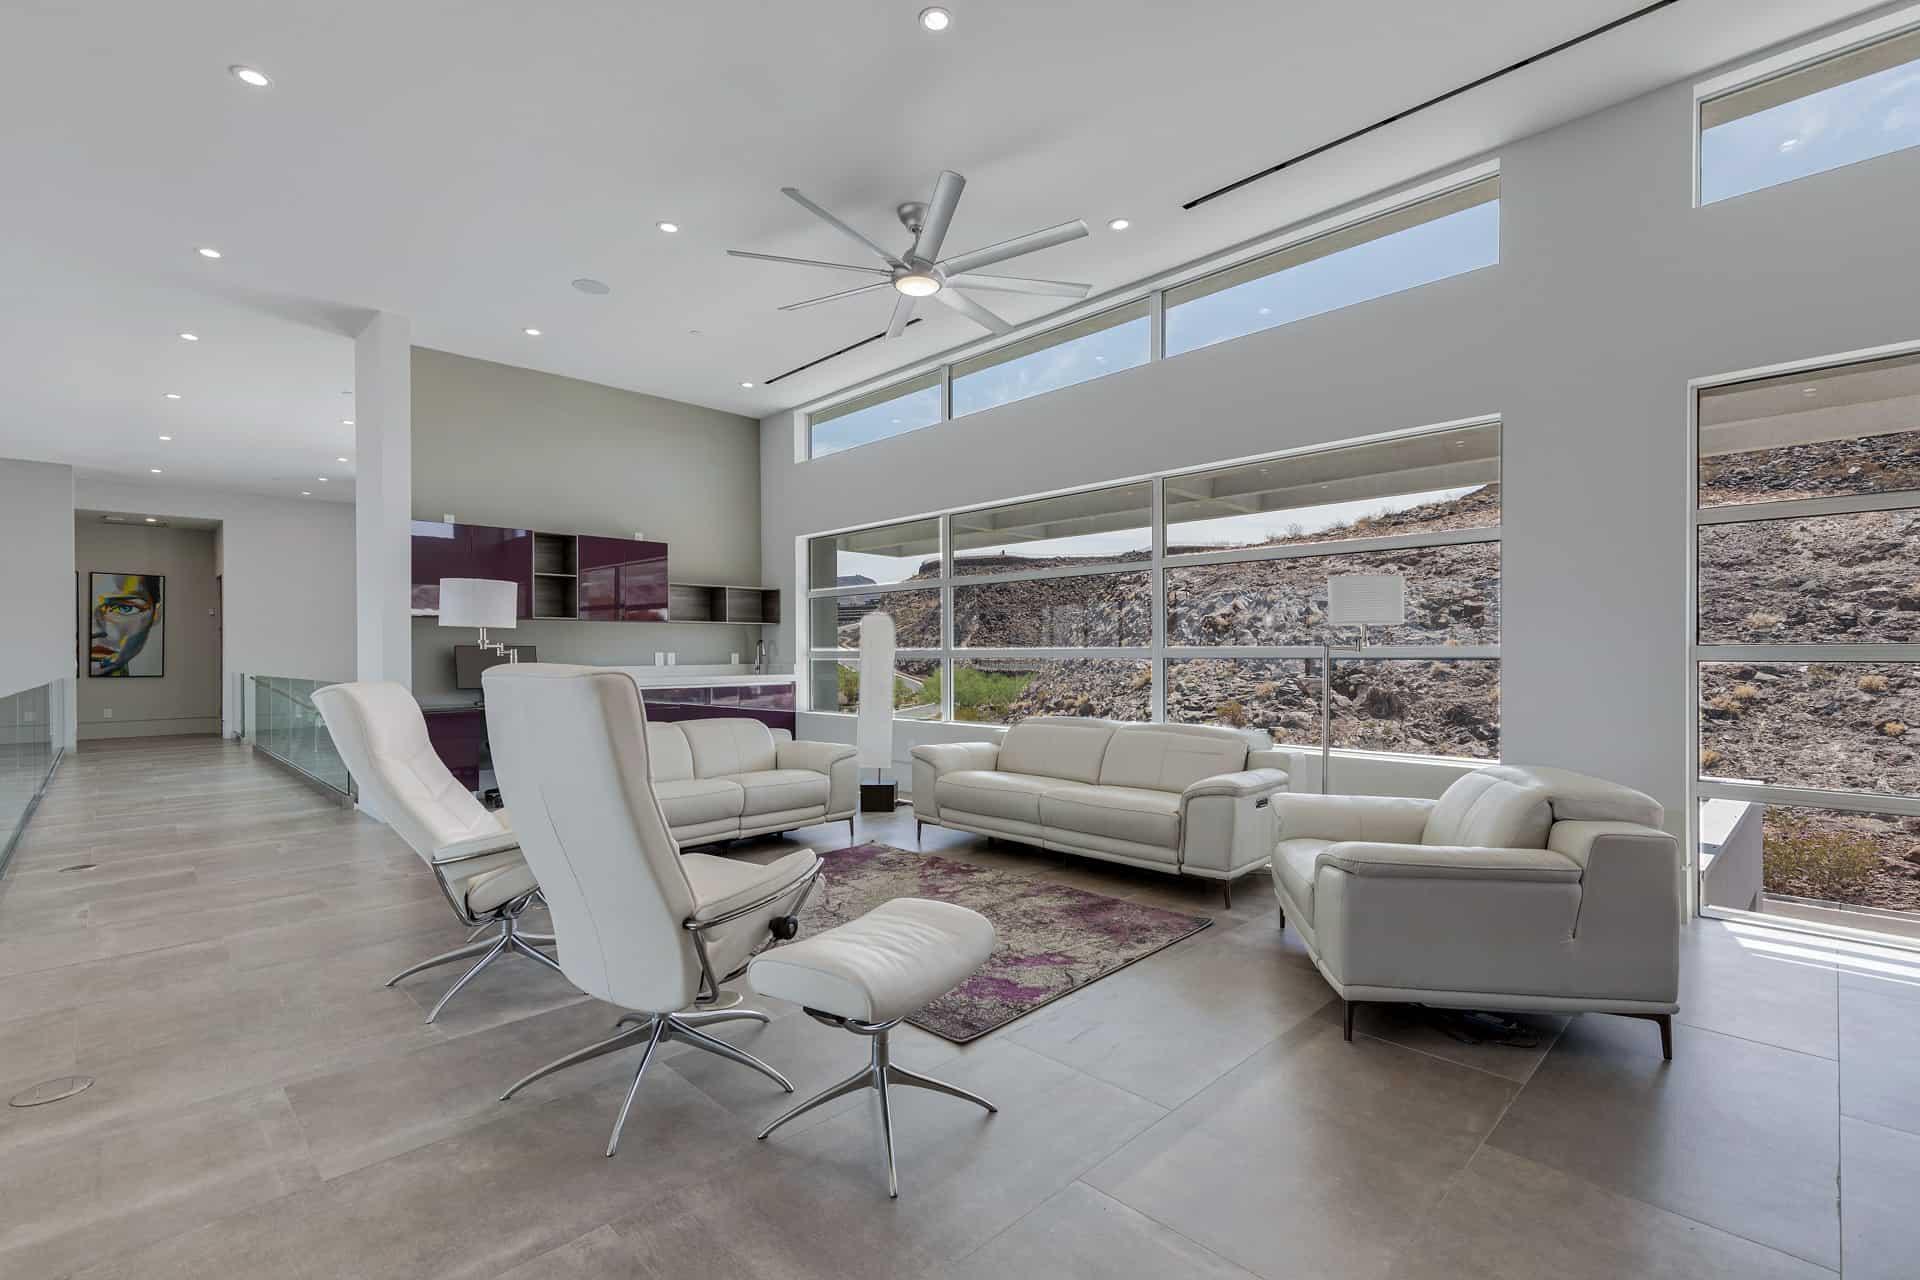 las-vegas-luxry-real-estate-realtor-rob-jensen-company-5-rockstream-drive-ascaya054